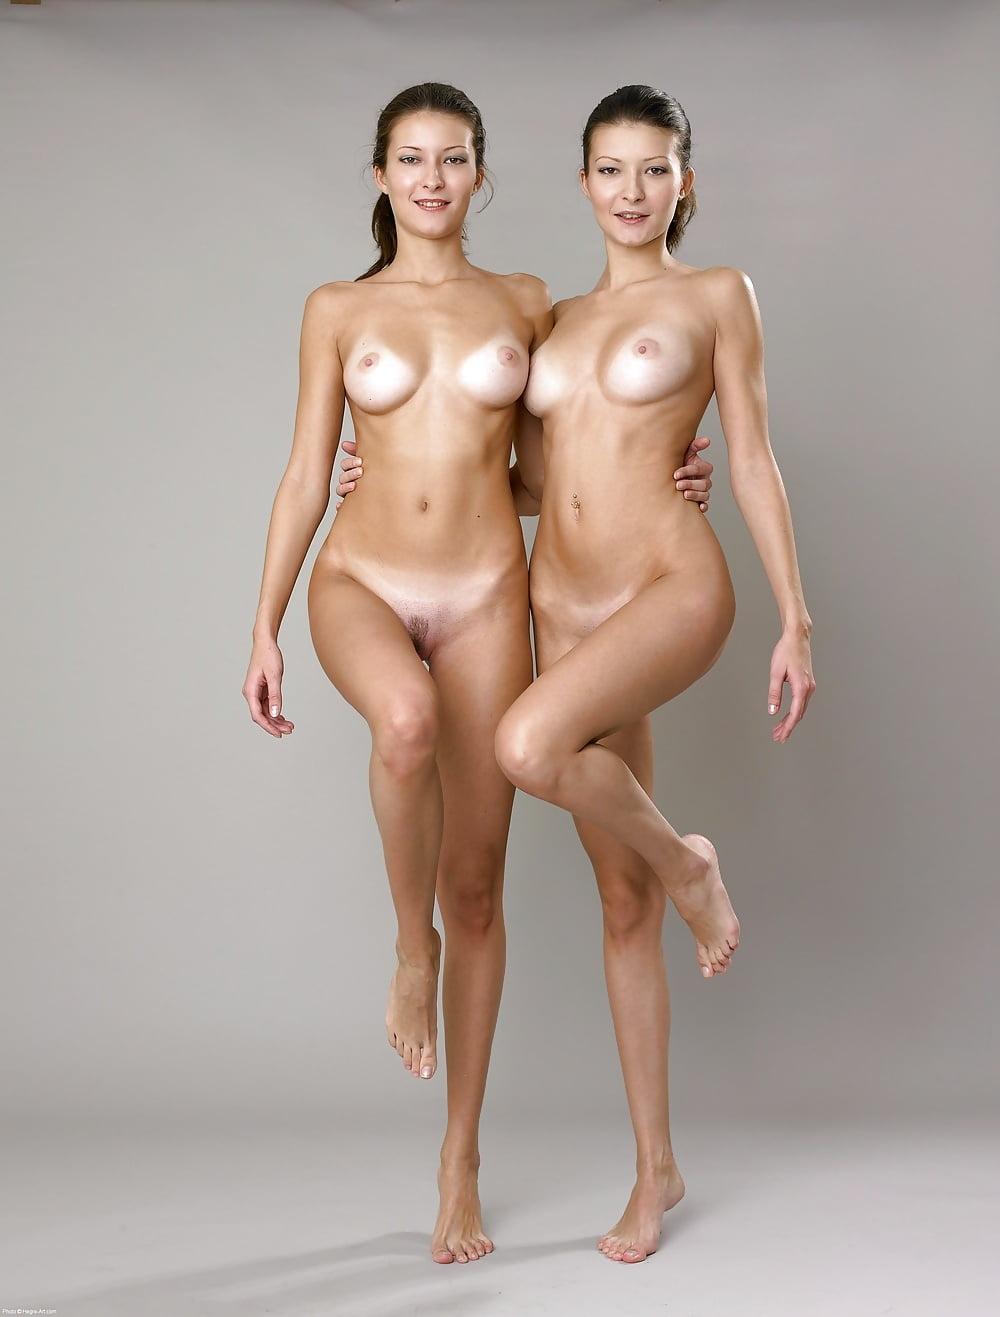 Masturbating Identical Twin Sisters Nude